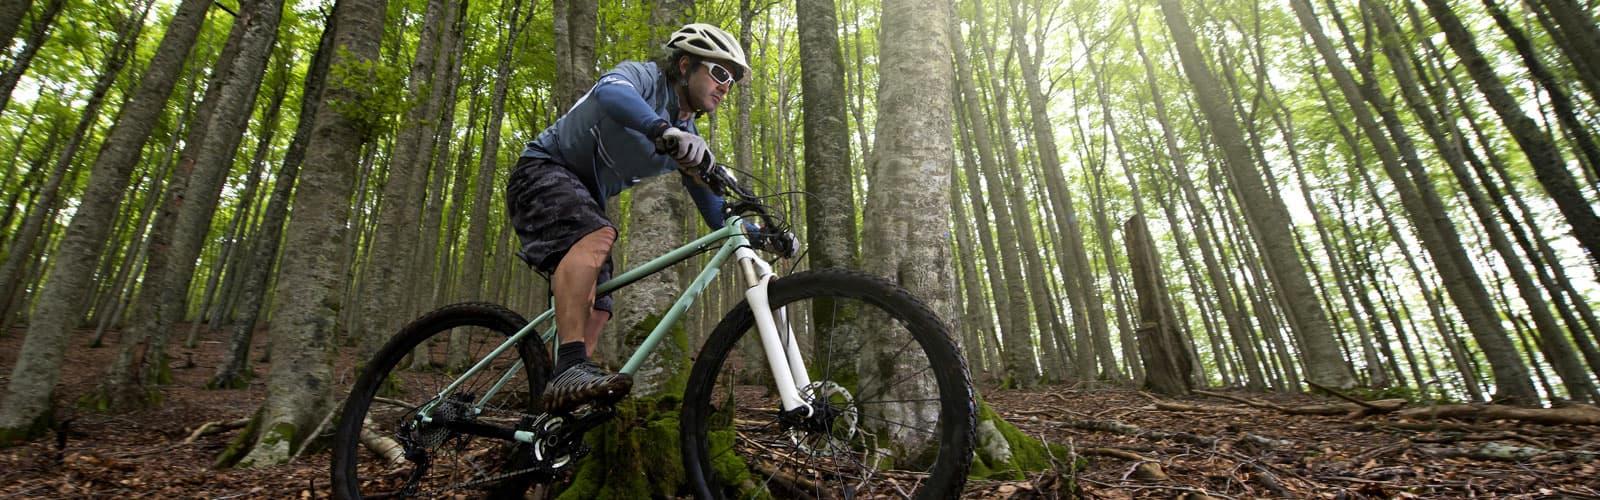 Mountain Bike and Commuter Bike Fit